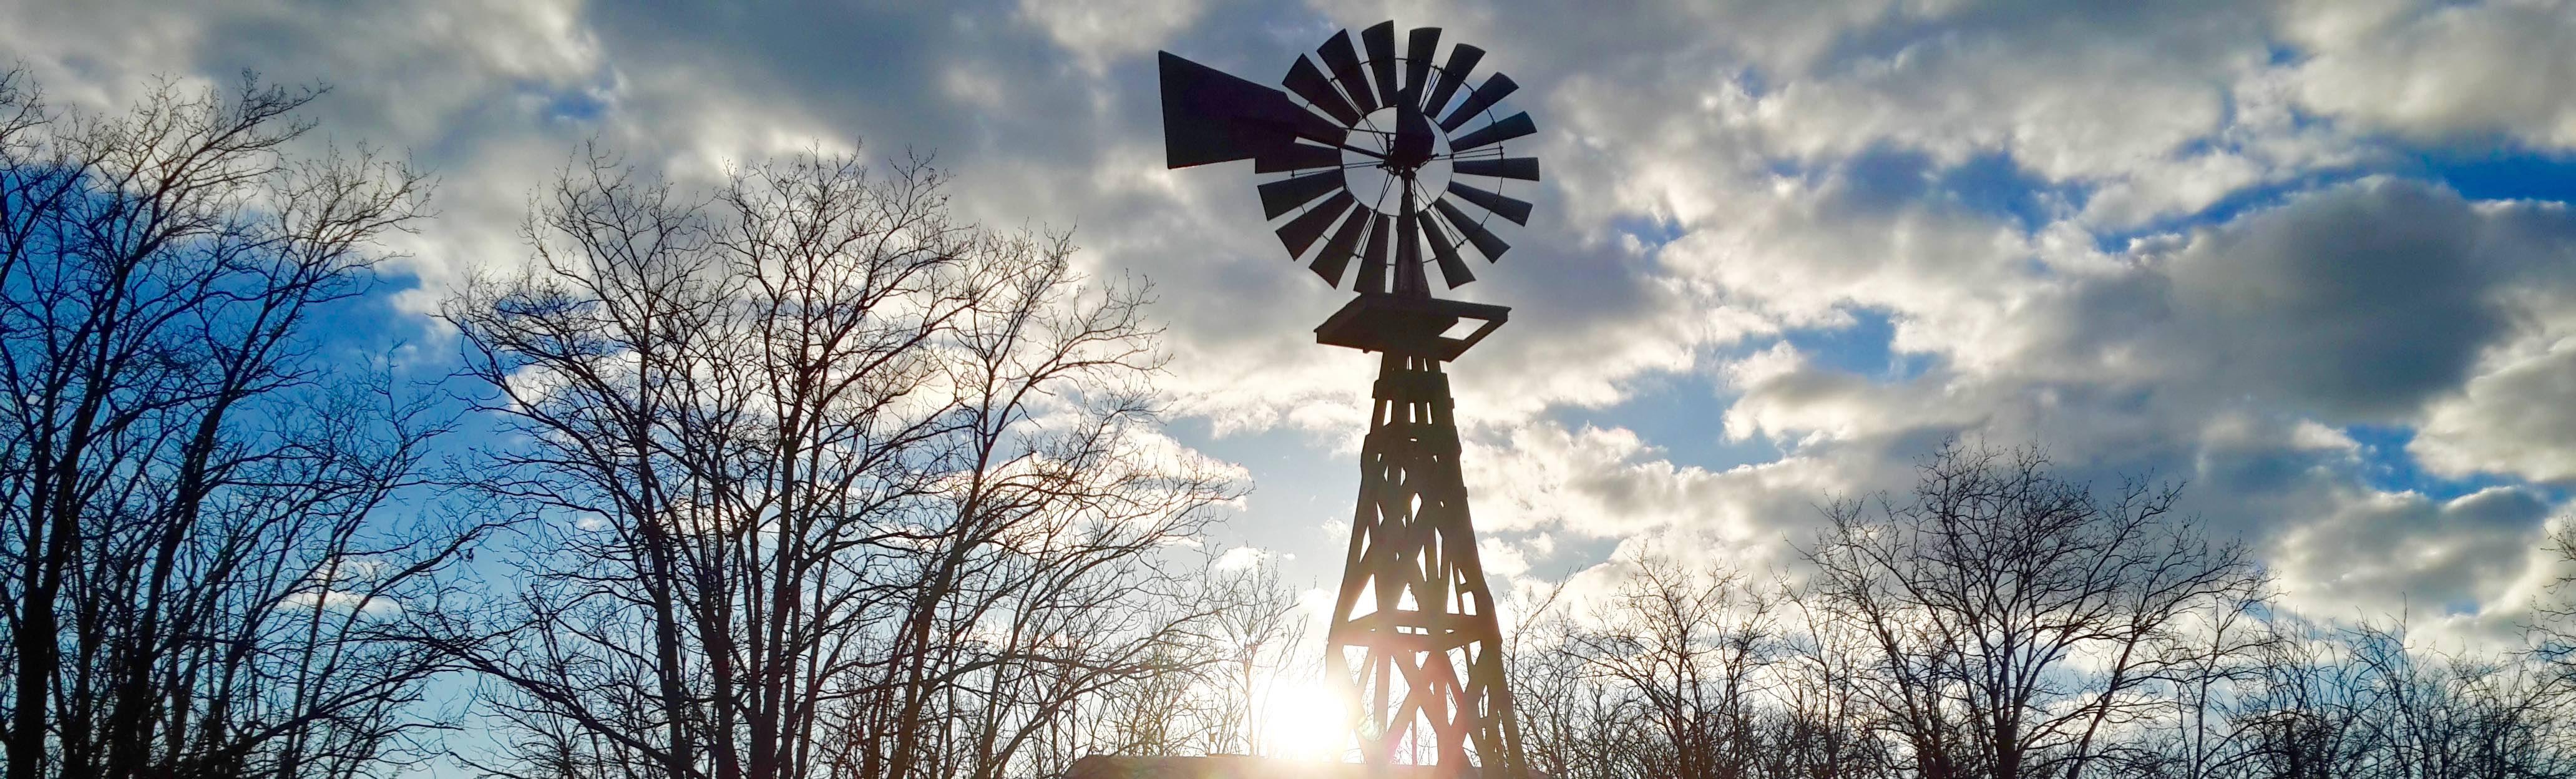 windmill-thru-sun.jpg